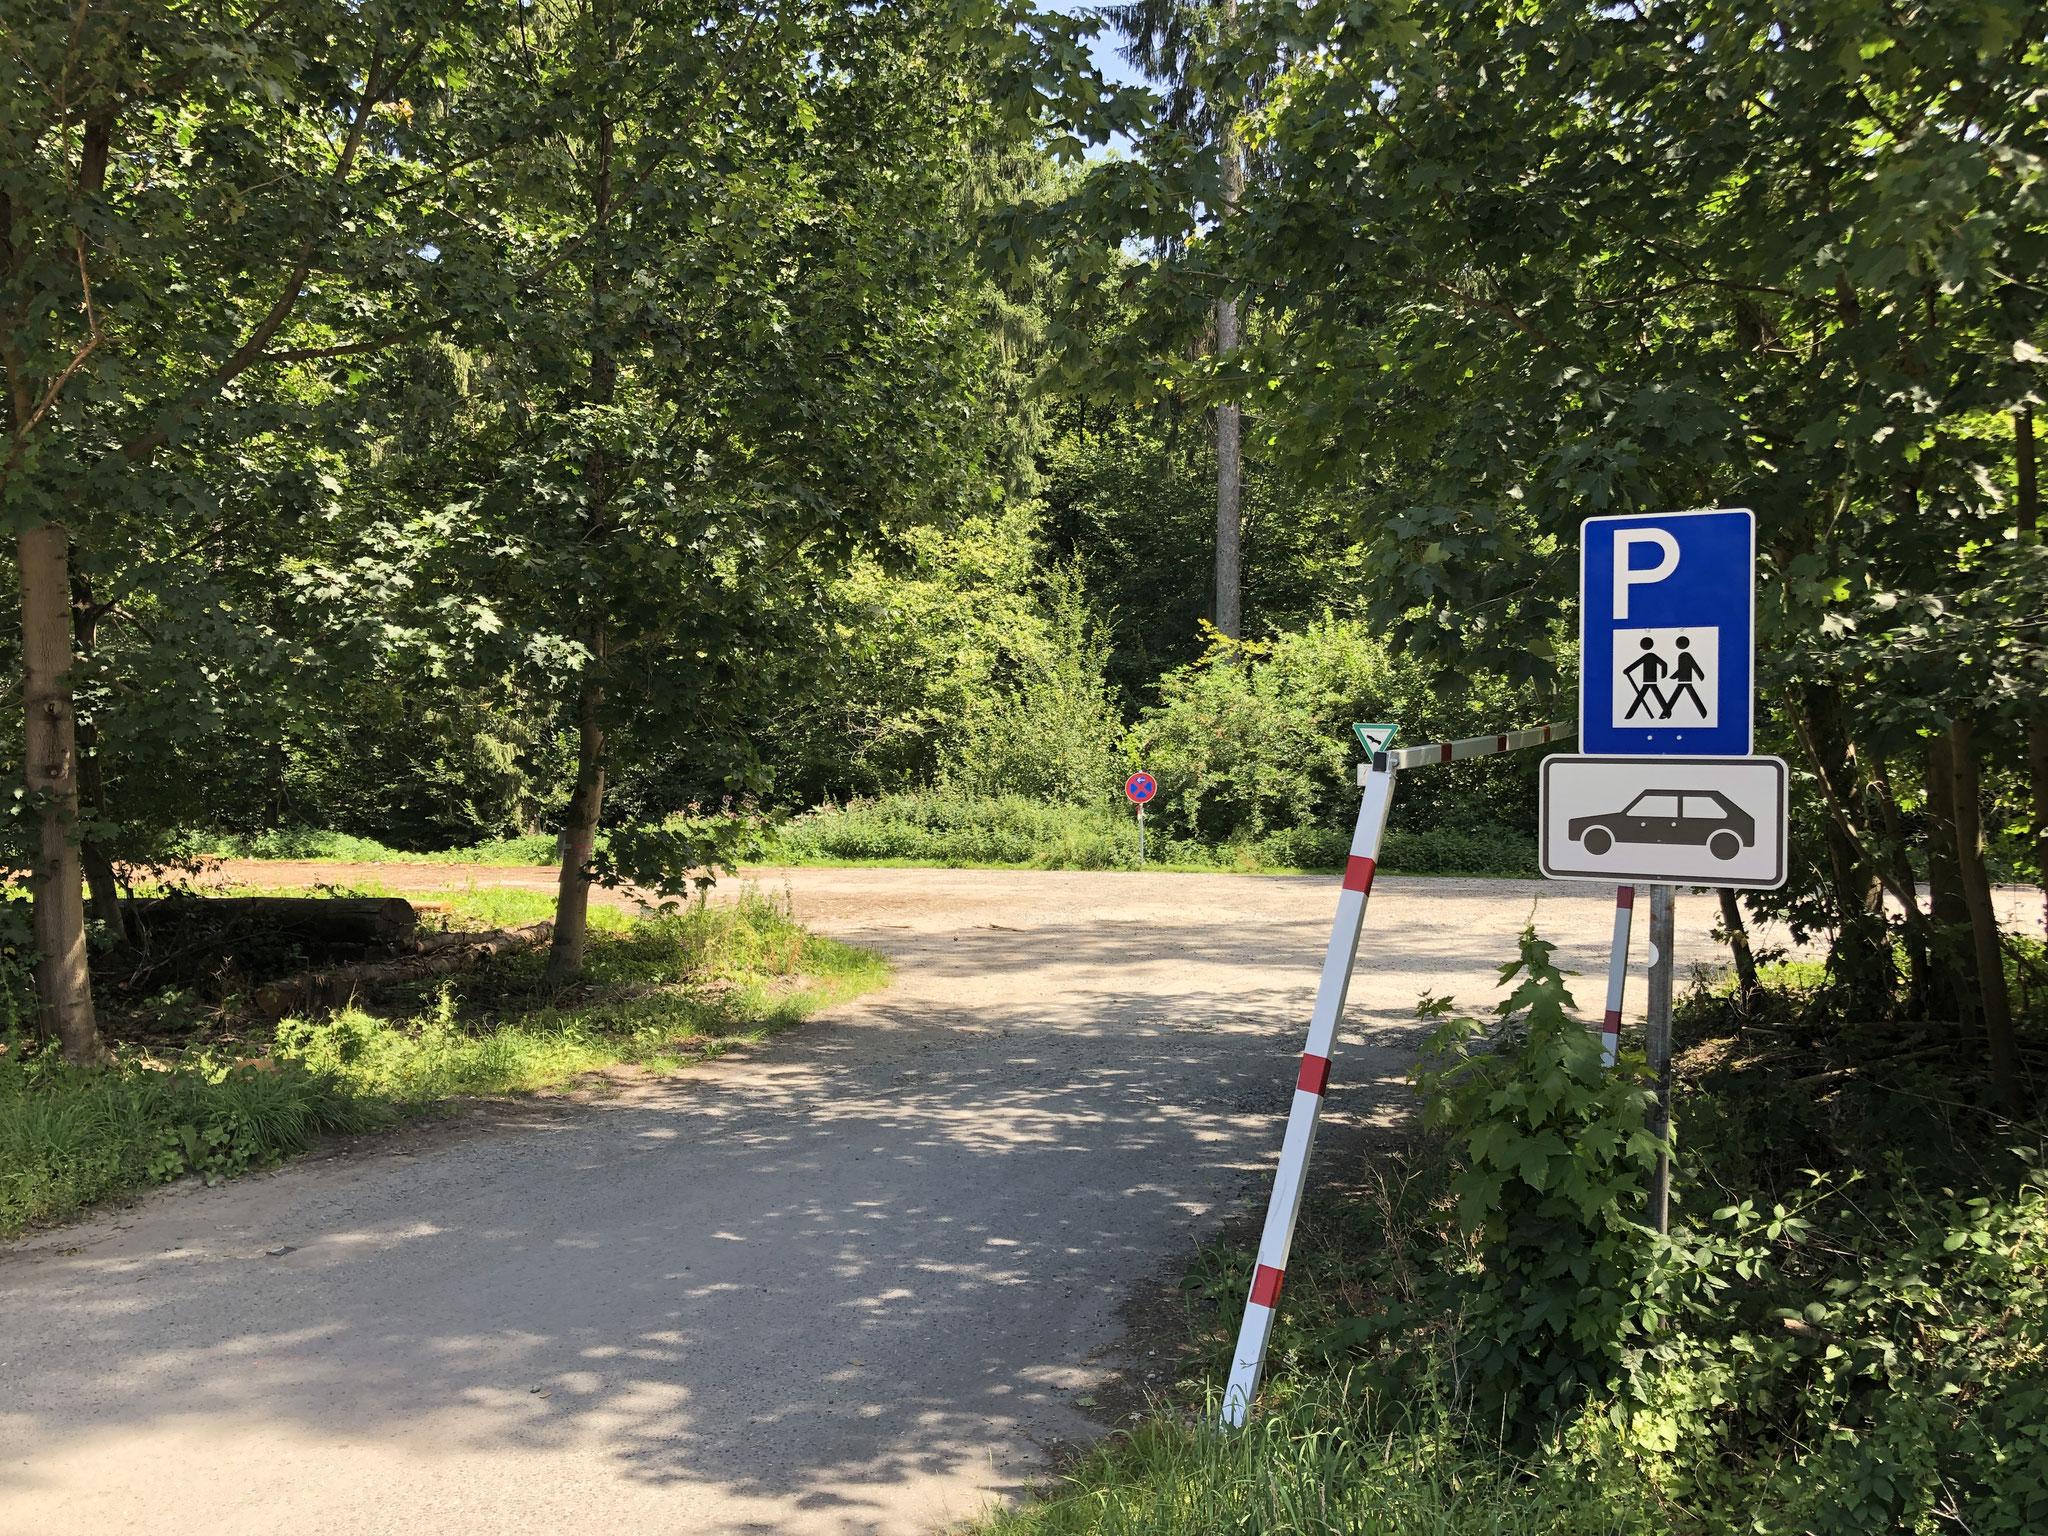 Bitte auch den Wanderparkplatz benutzen (5 Gehminuten Richtung Odenthal)